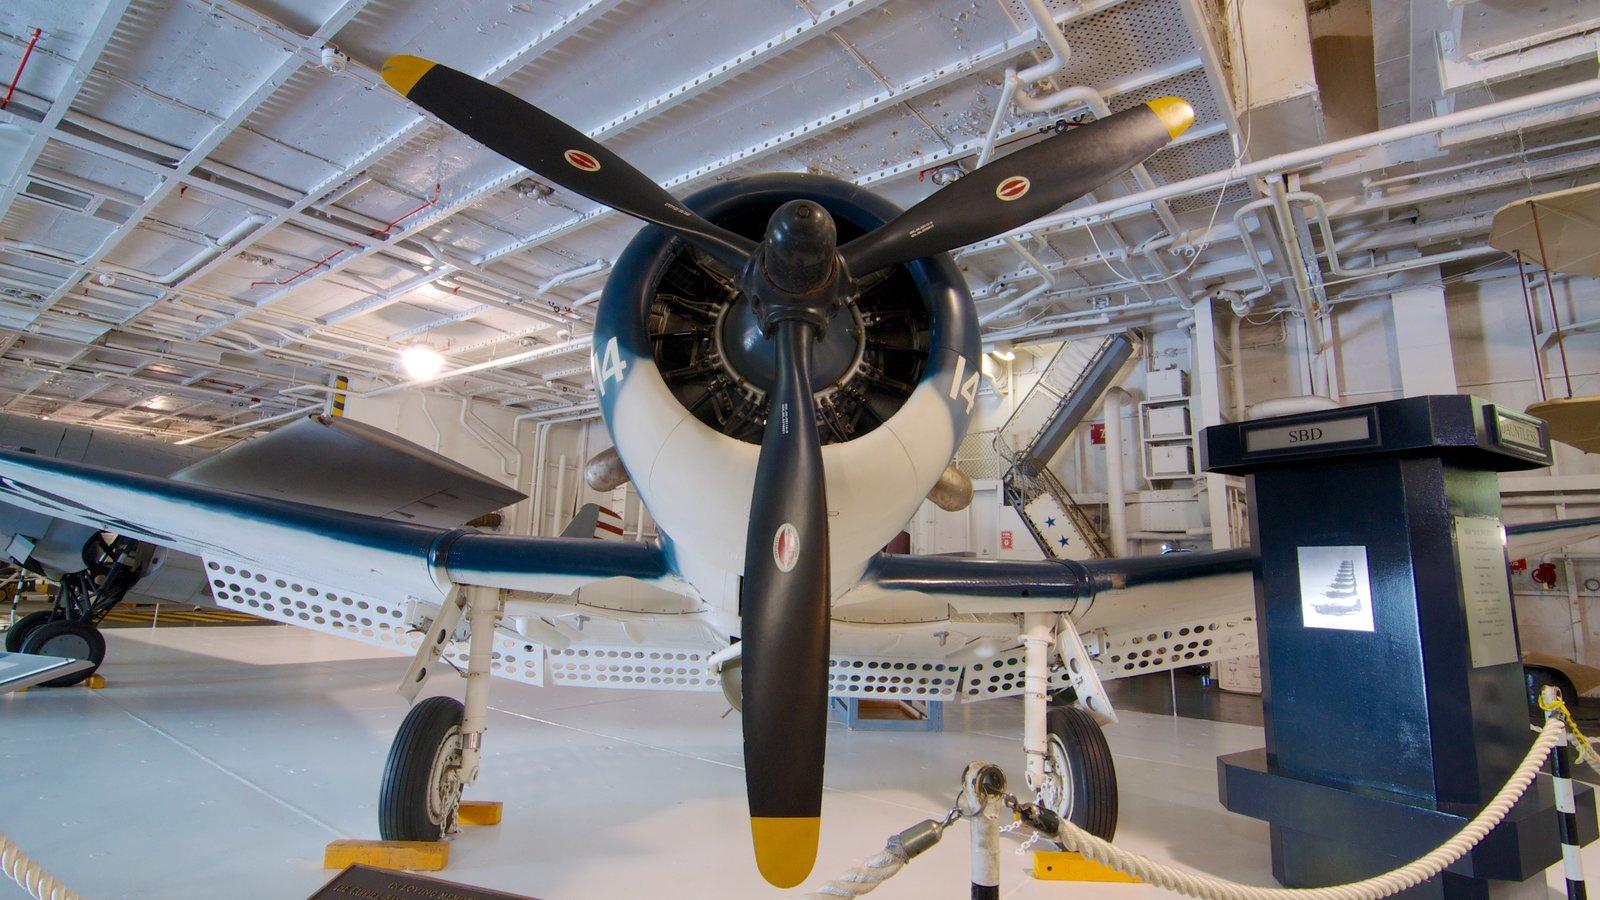 USS Yorktown mostrando vistas internas e aeronave